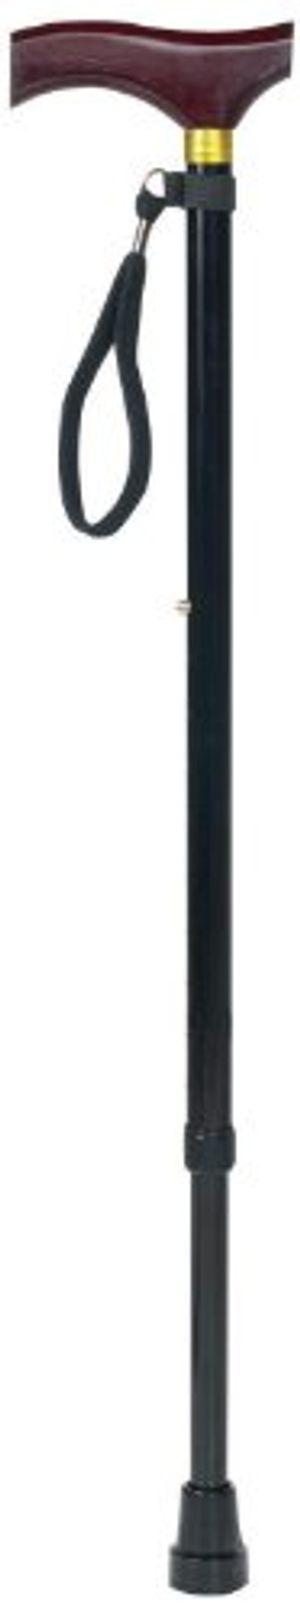 ofertas para - aidapt bastón de madera con mango longitud regulable